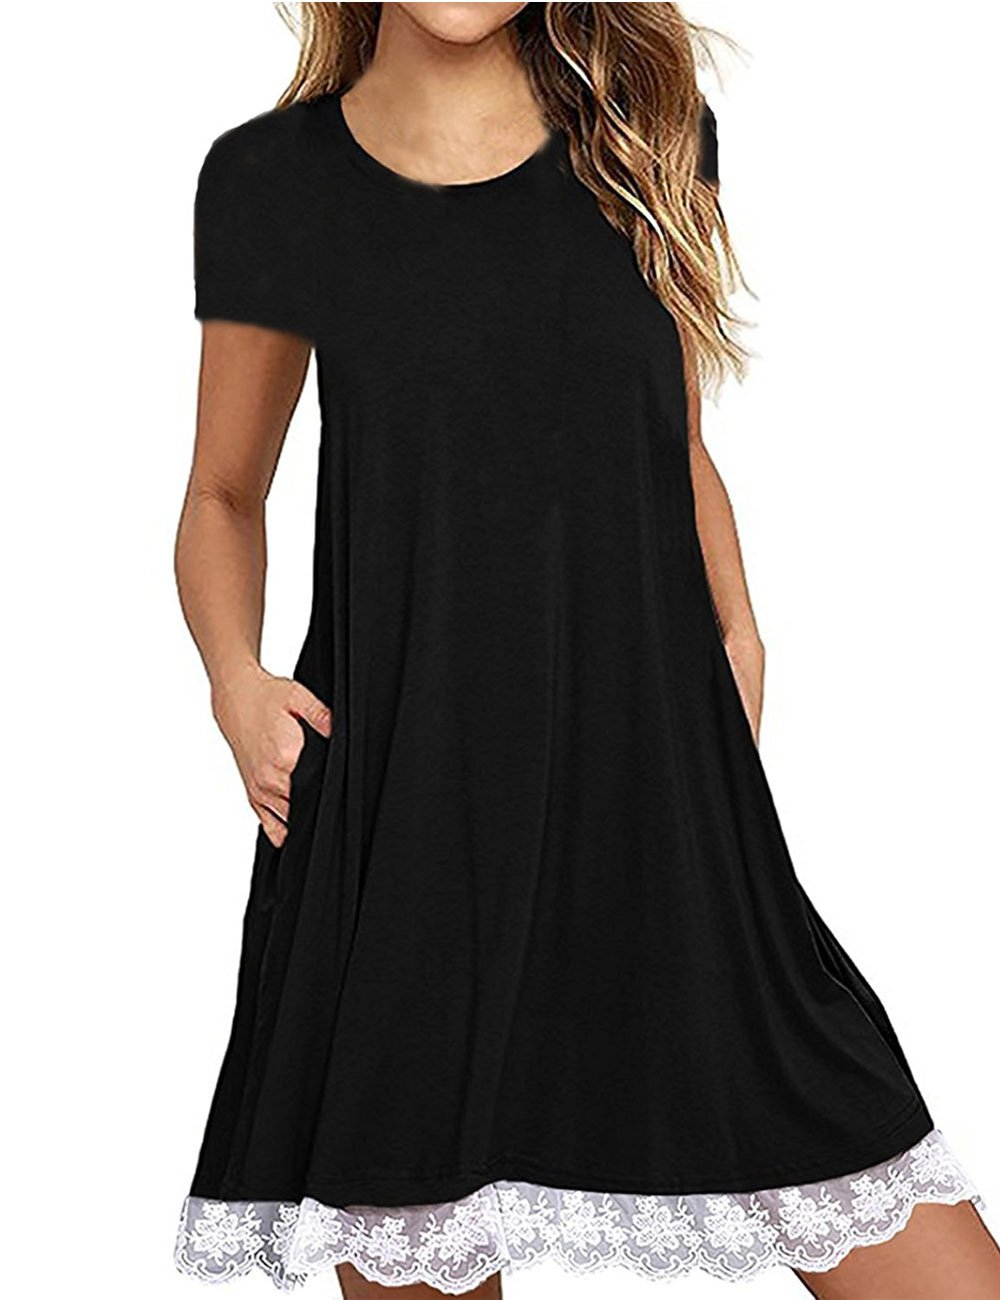 Halife Women's Short Sleeve Pockets Loose T-Shirt Dress Casual Swing Lace Summer Dress Black,M